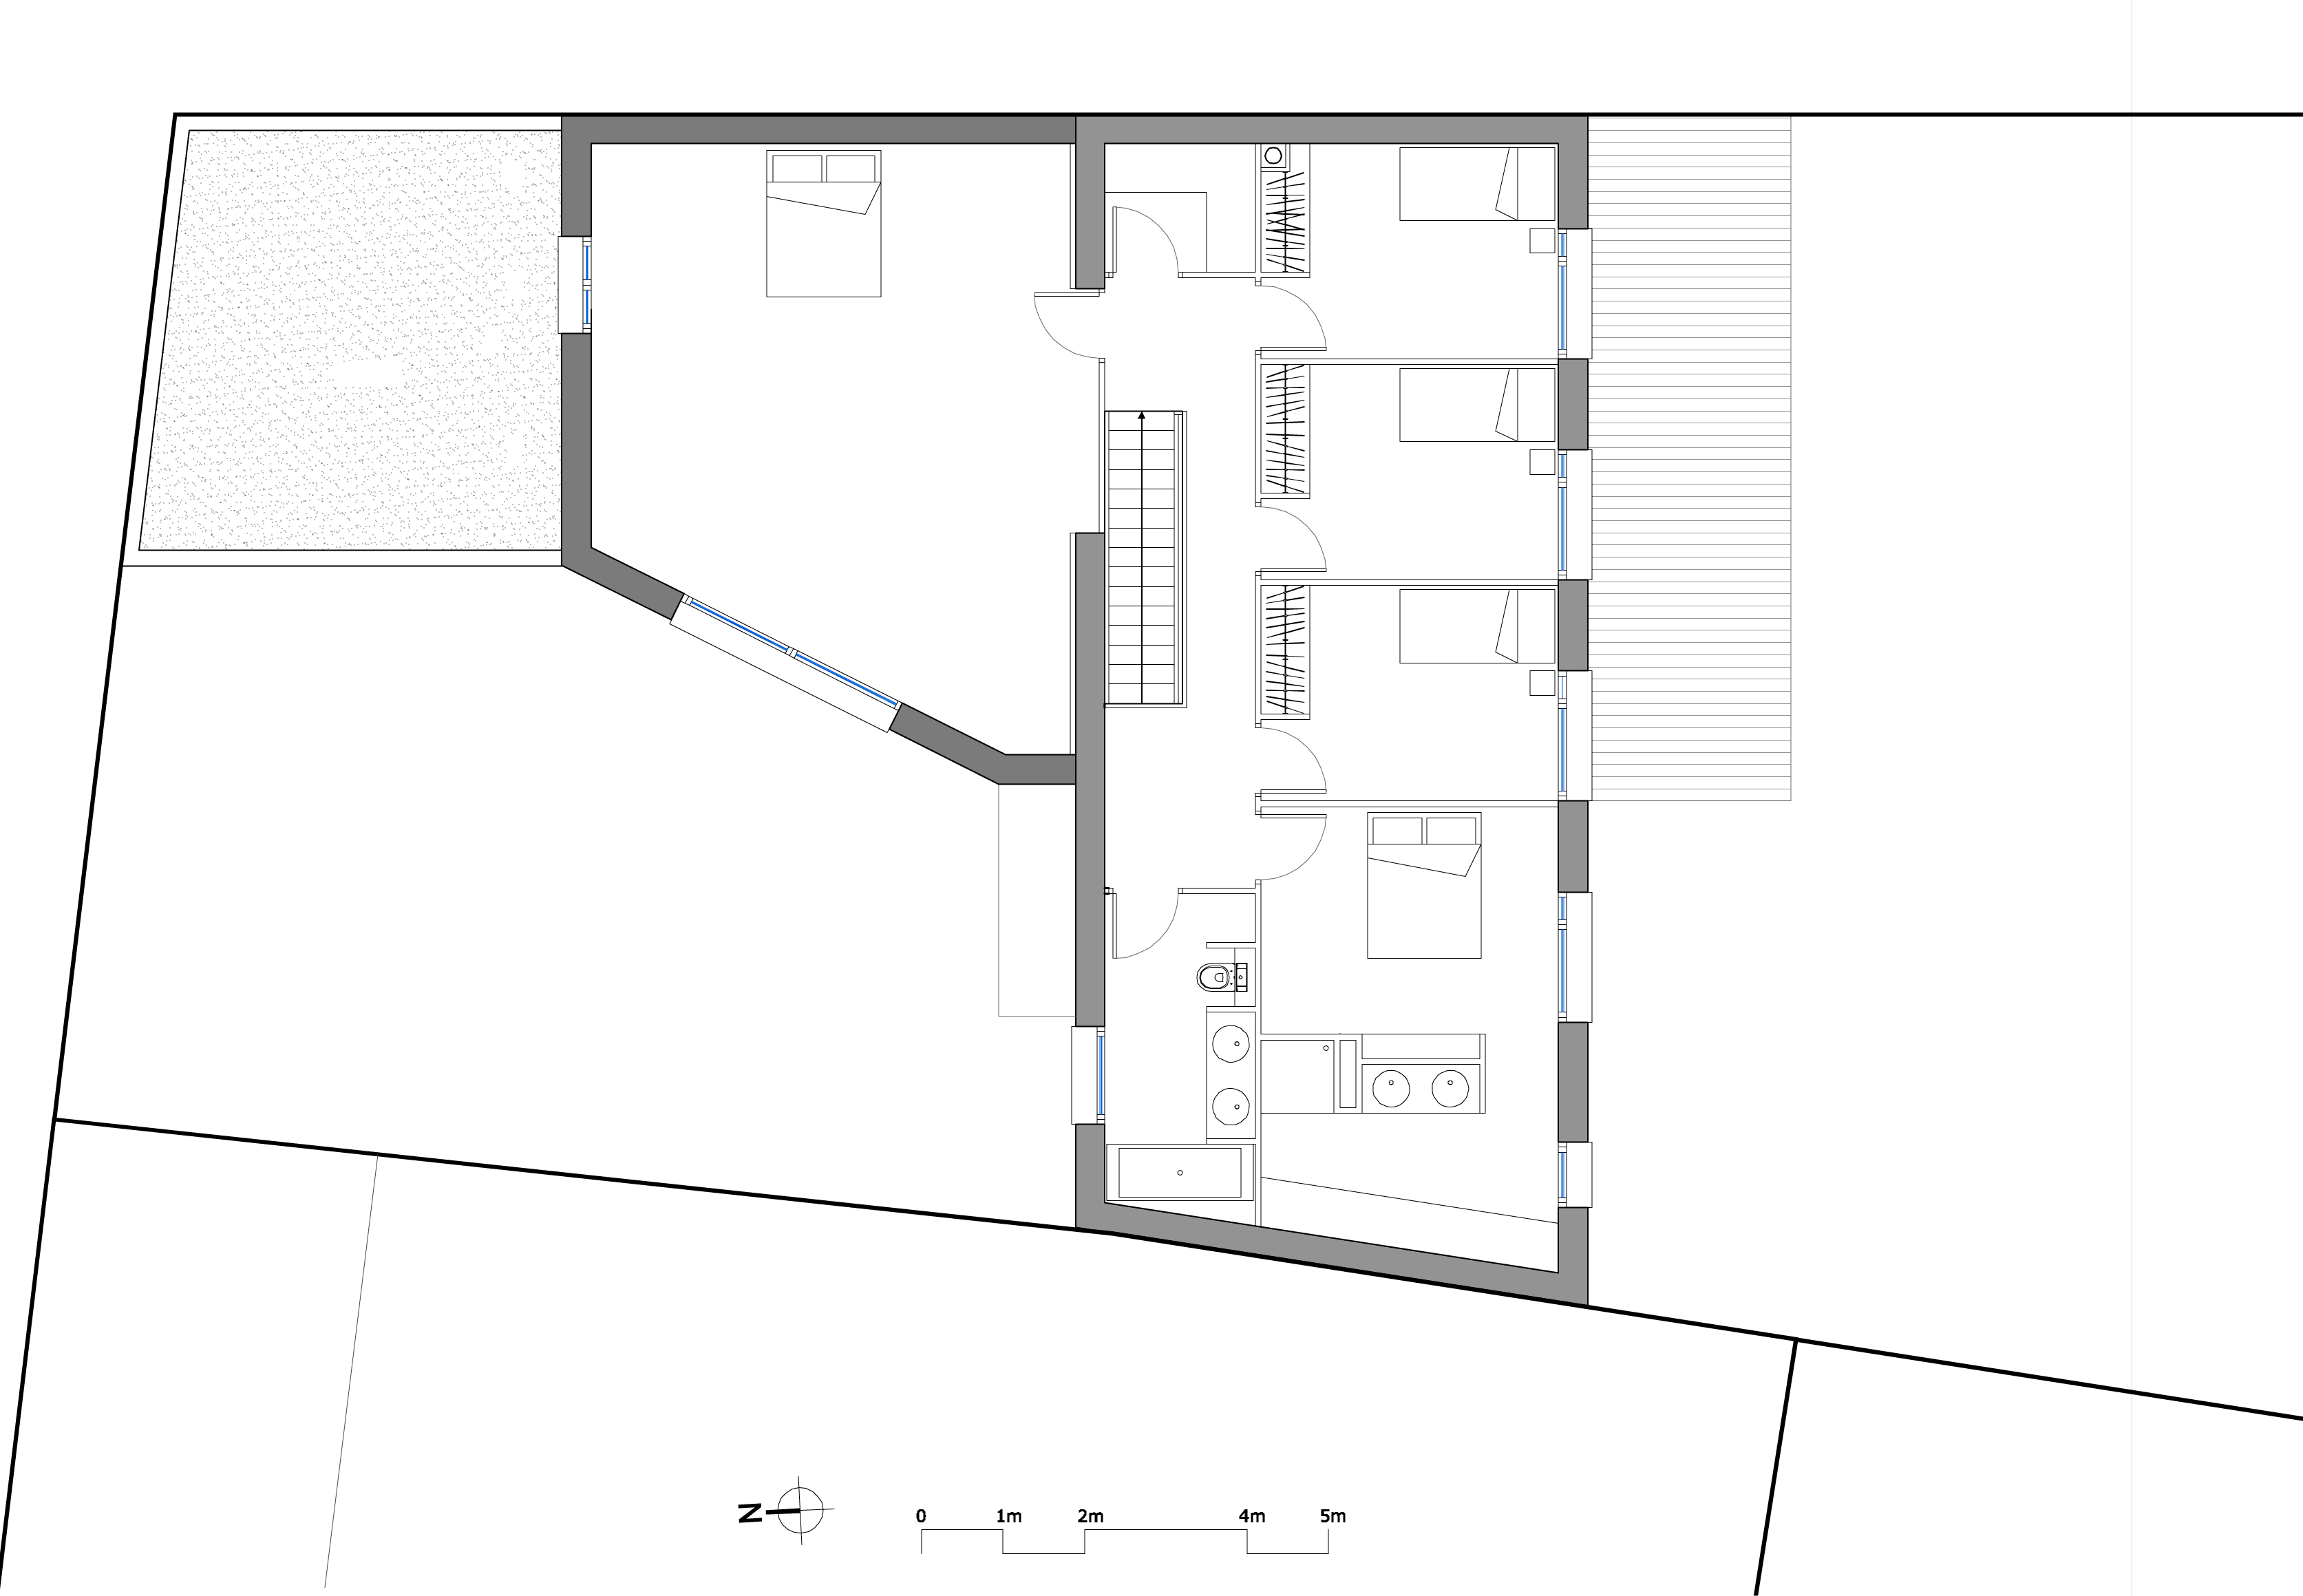 15.38 Atelier Permis de construire extension nord Cysoing9